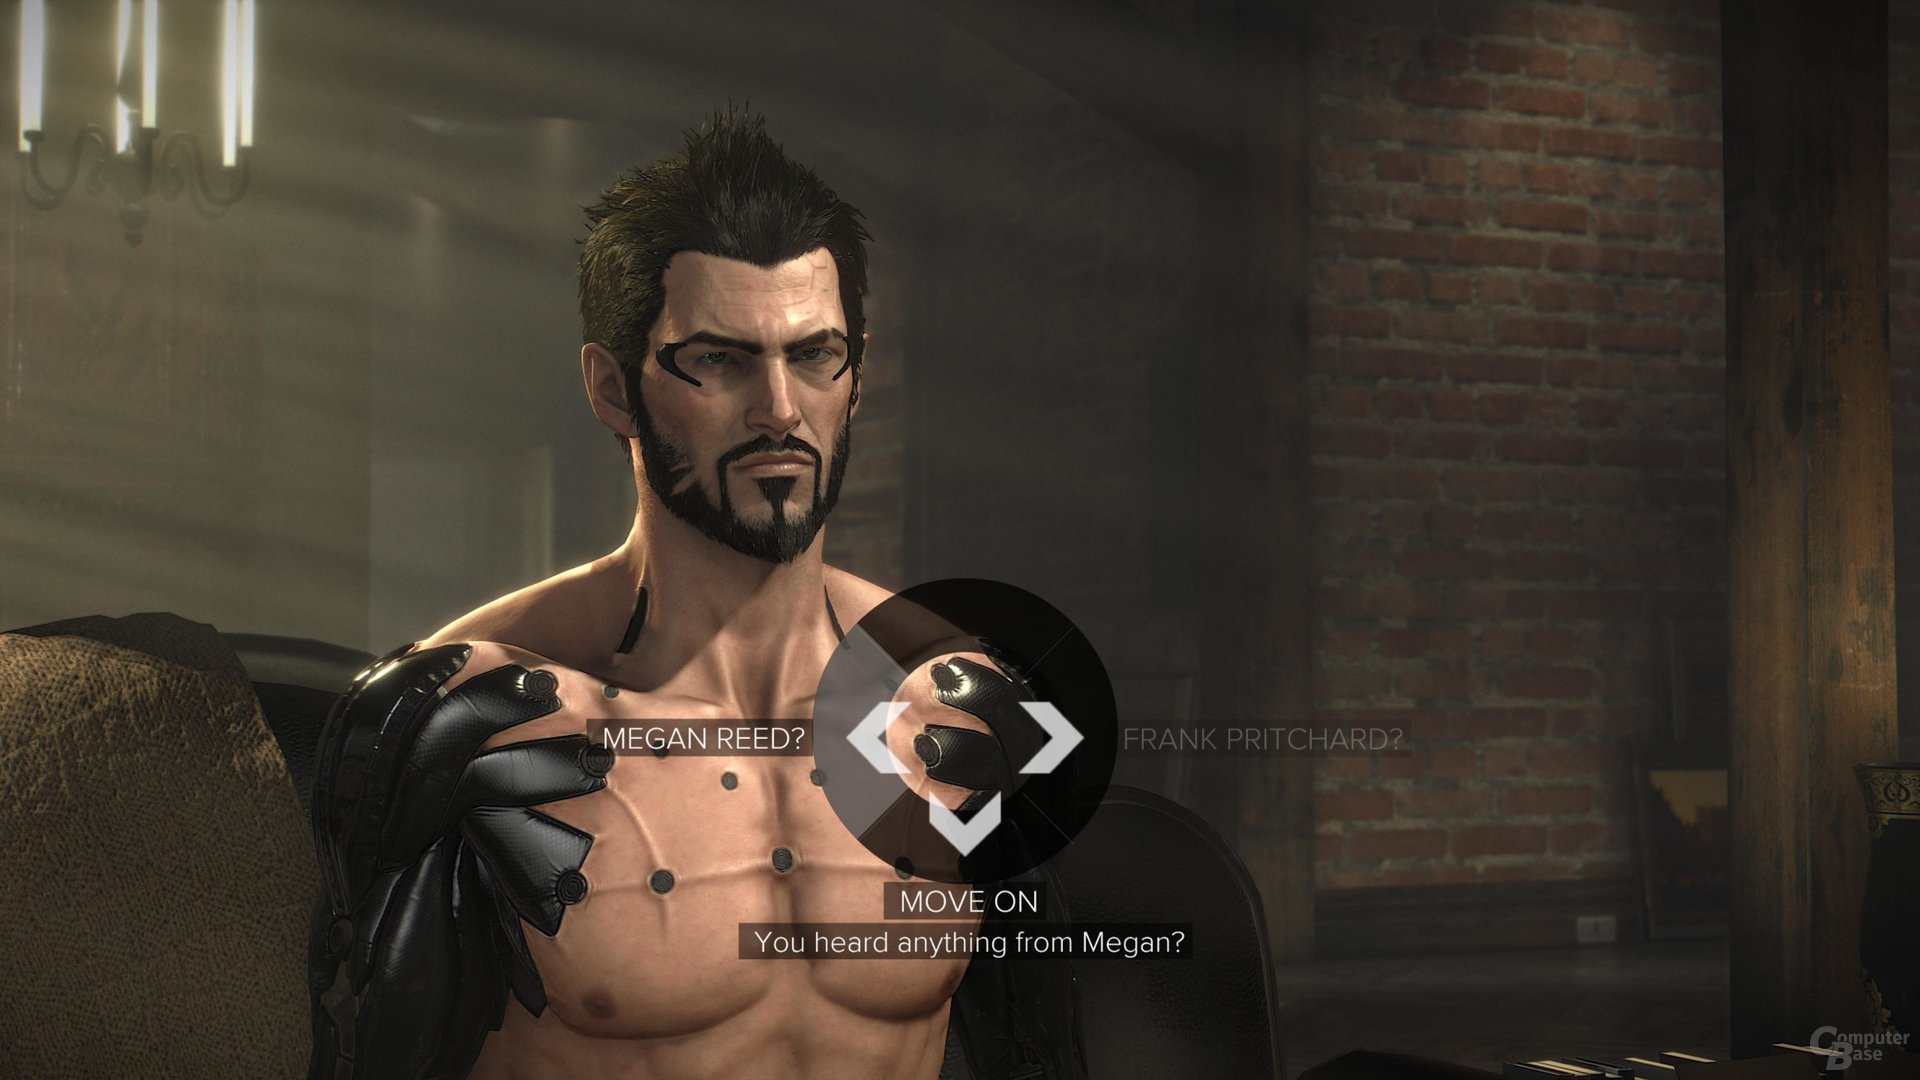 Dialoge ersetzen nun Bosskämpfe